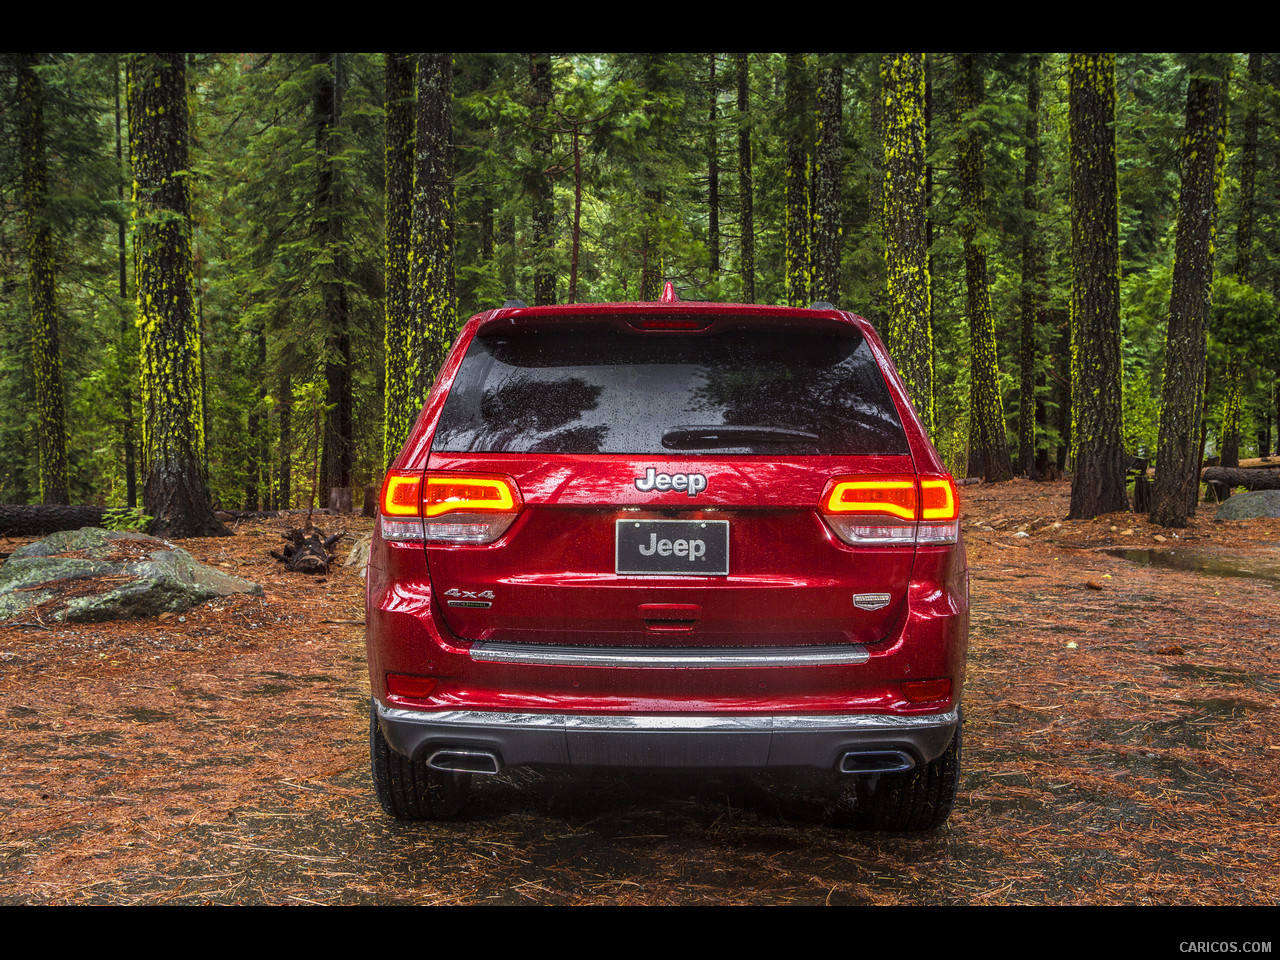 comparison gmc acadia limited 2017 vs jeep grand cherokee limited 3 6 2015 suv drive. Black Bedroom Furniture Sets. Home Design Ideas